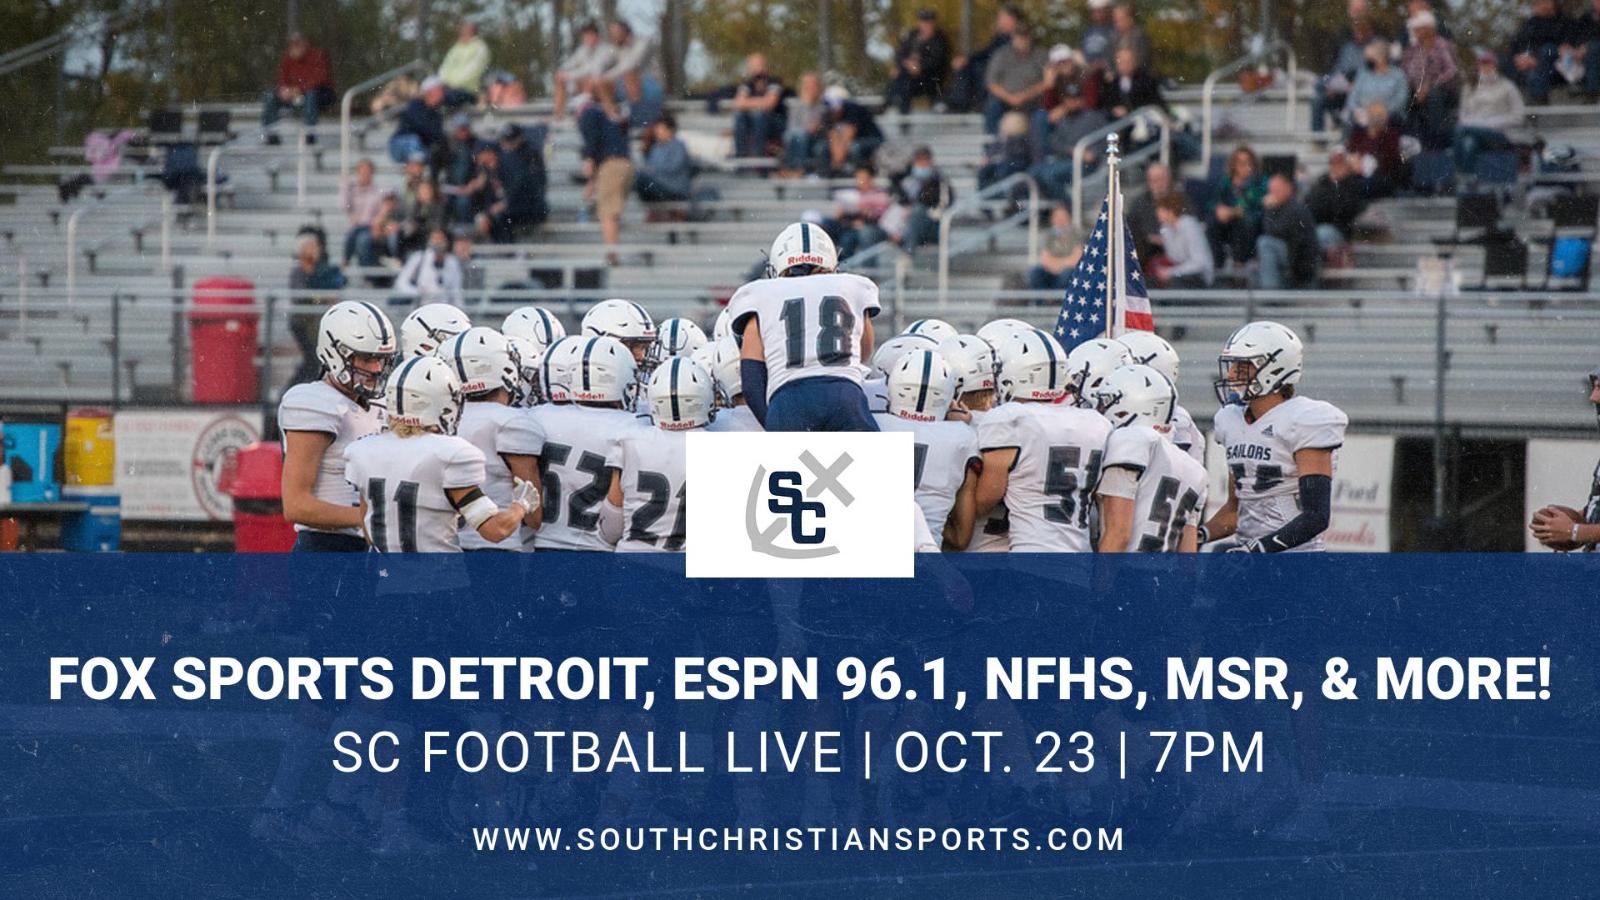 Varsity Football vs. Catholic Central on 10/23 – Ways to Watch or Listen